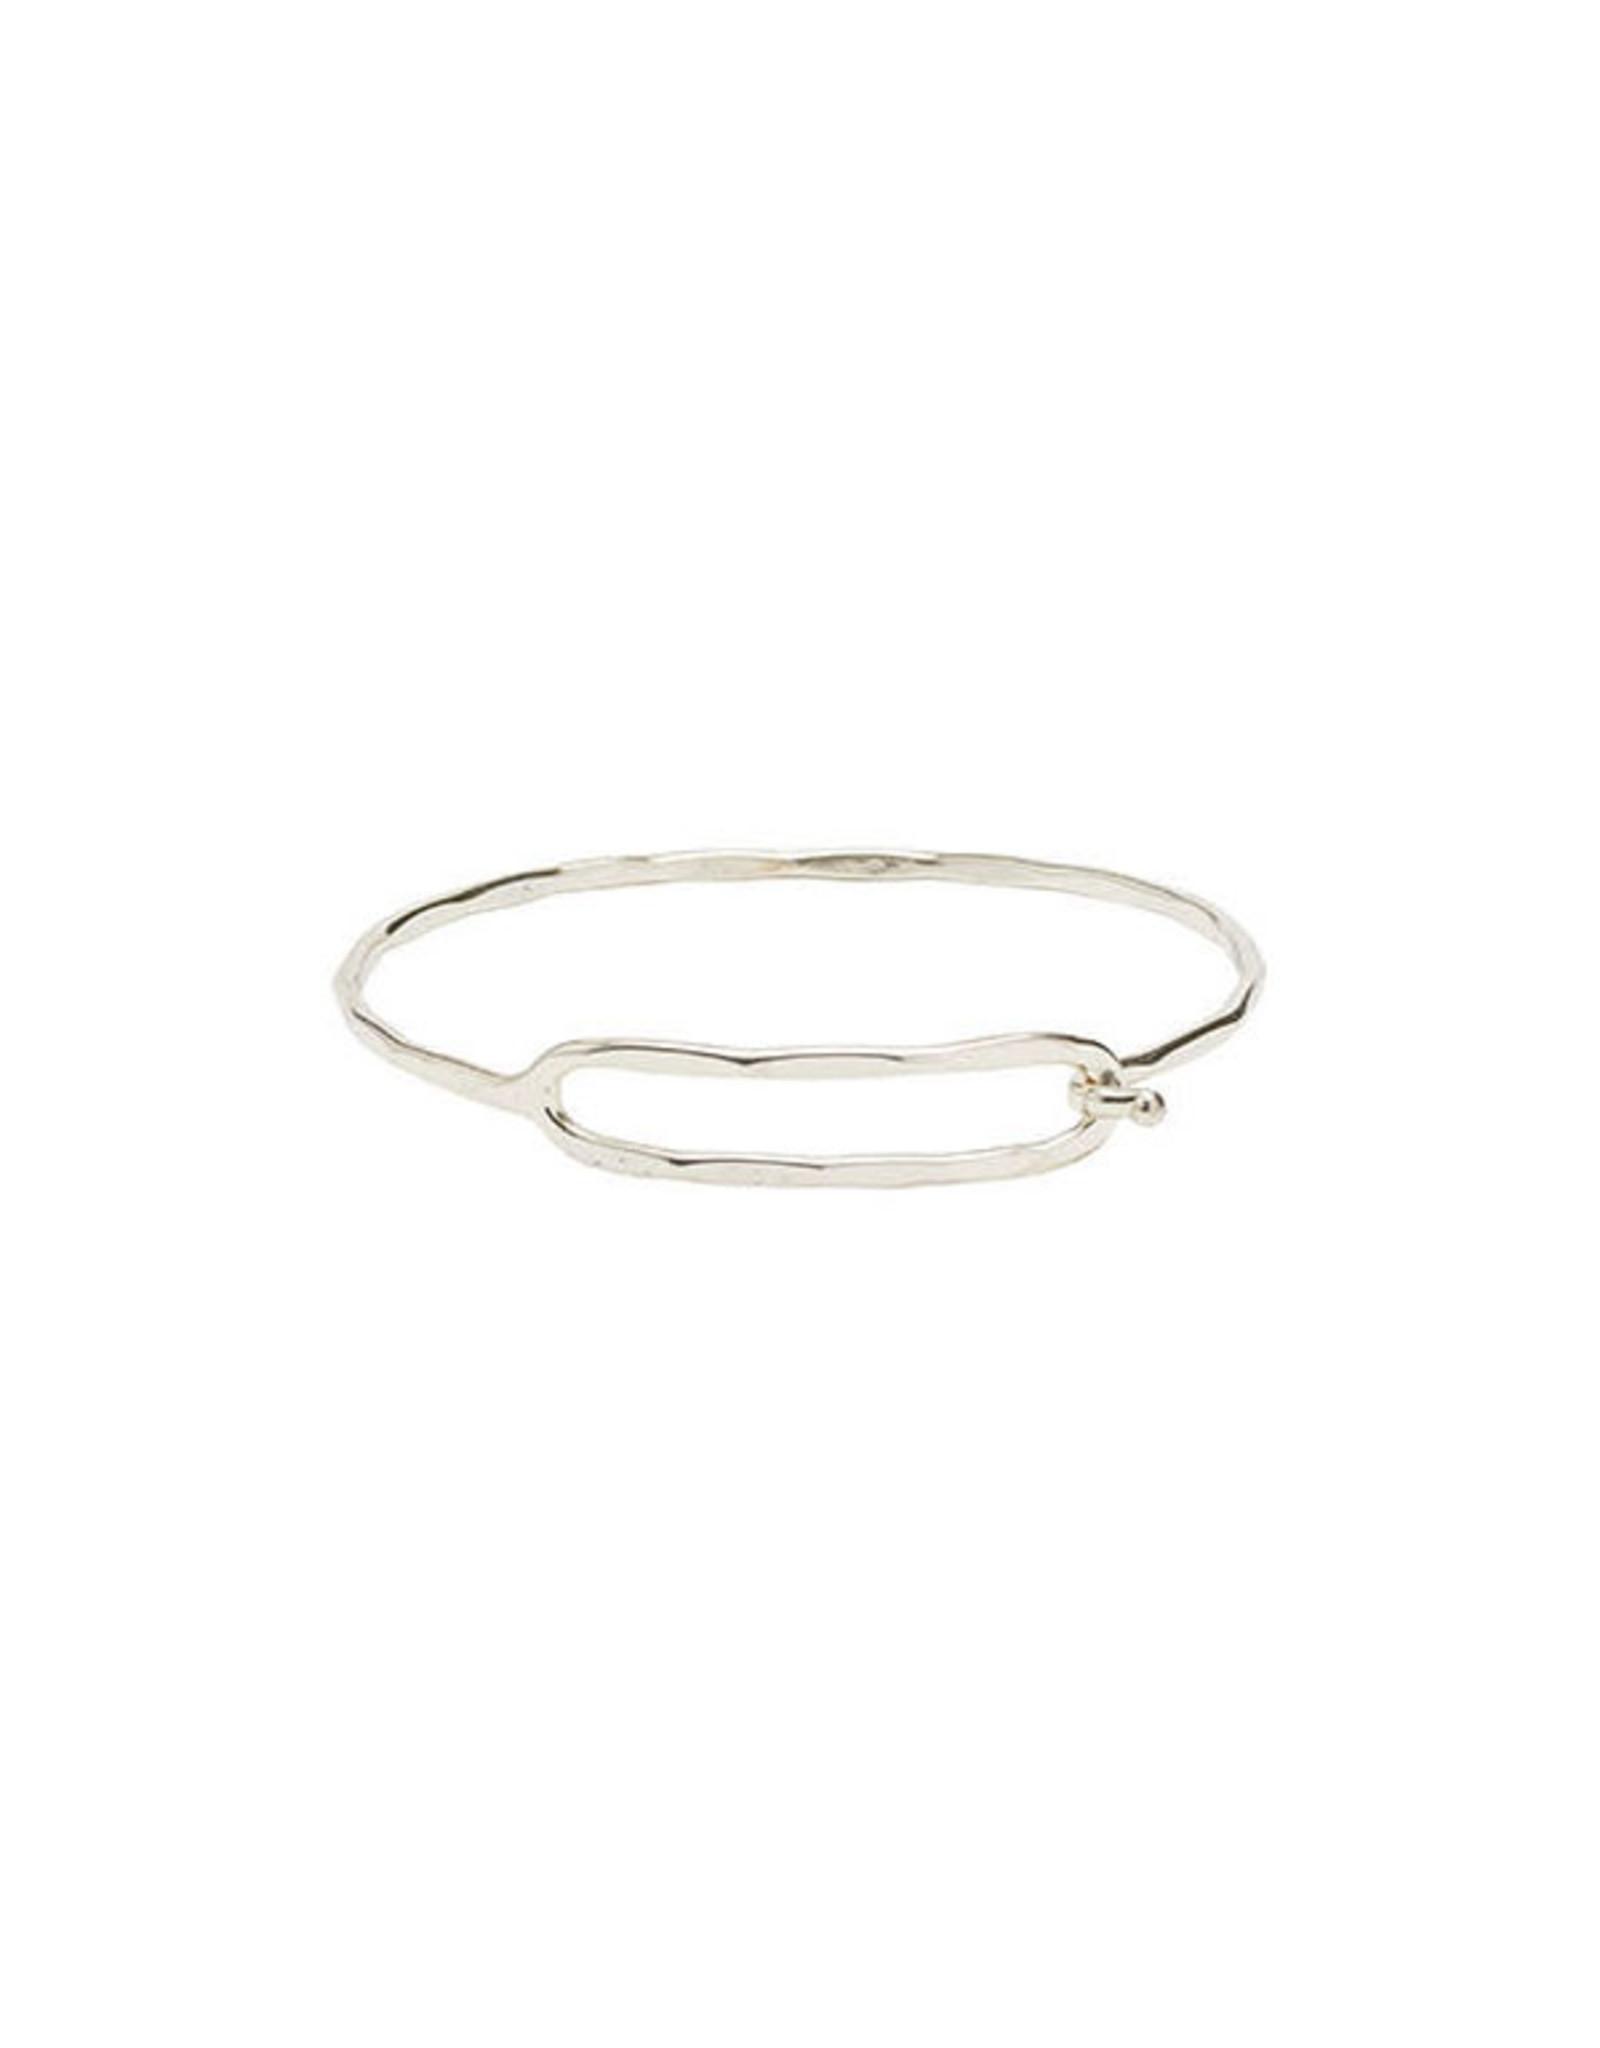 Rippled Ellipse Bracelet - Silver